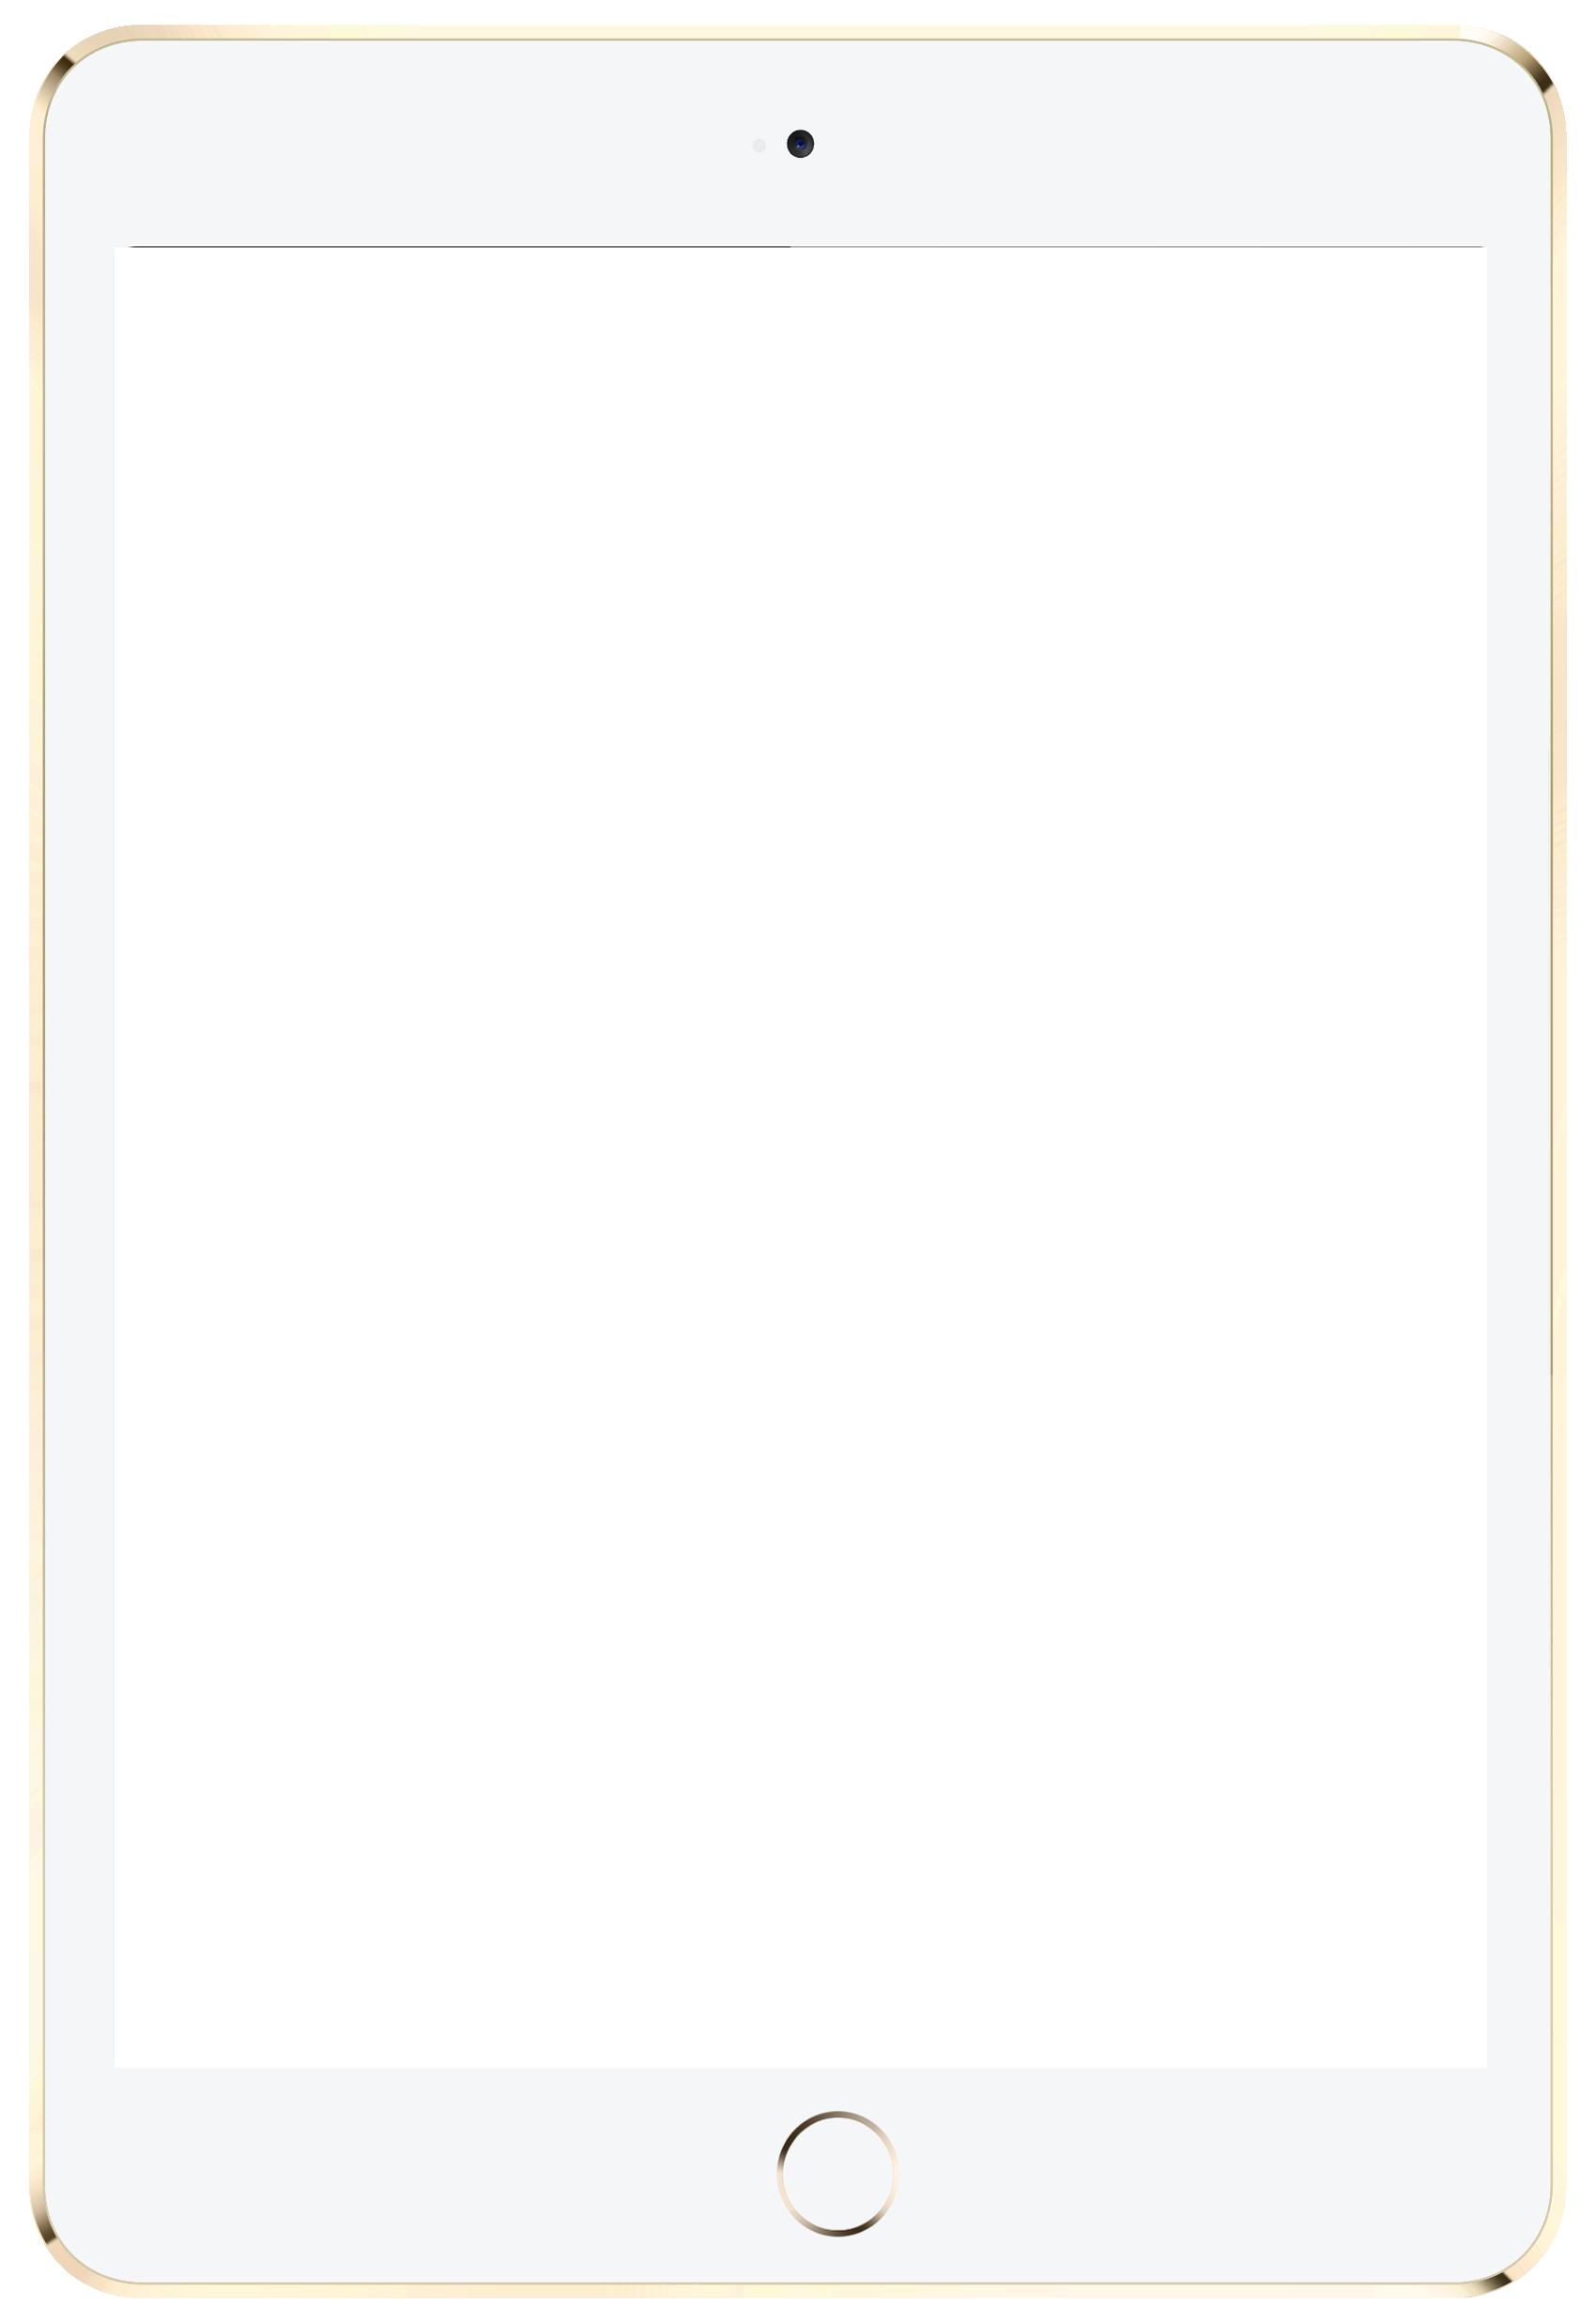 Ipad White Png